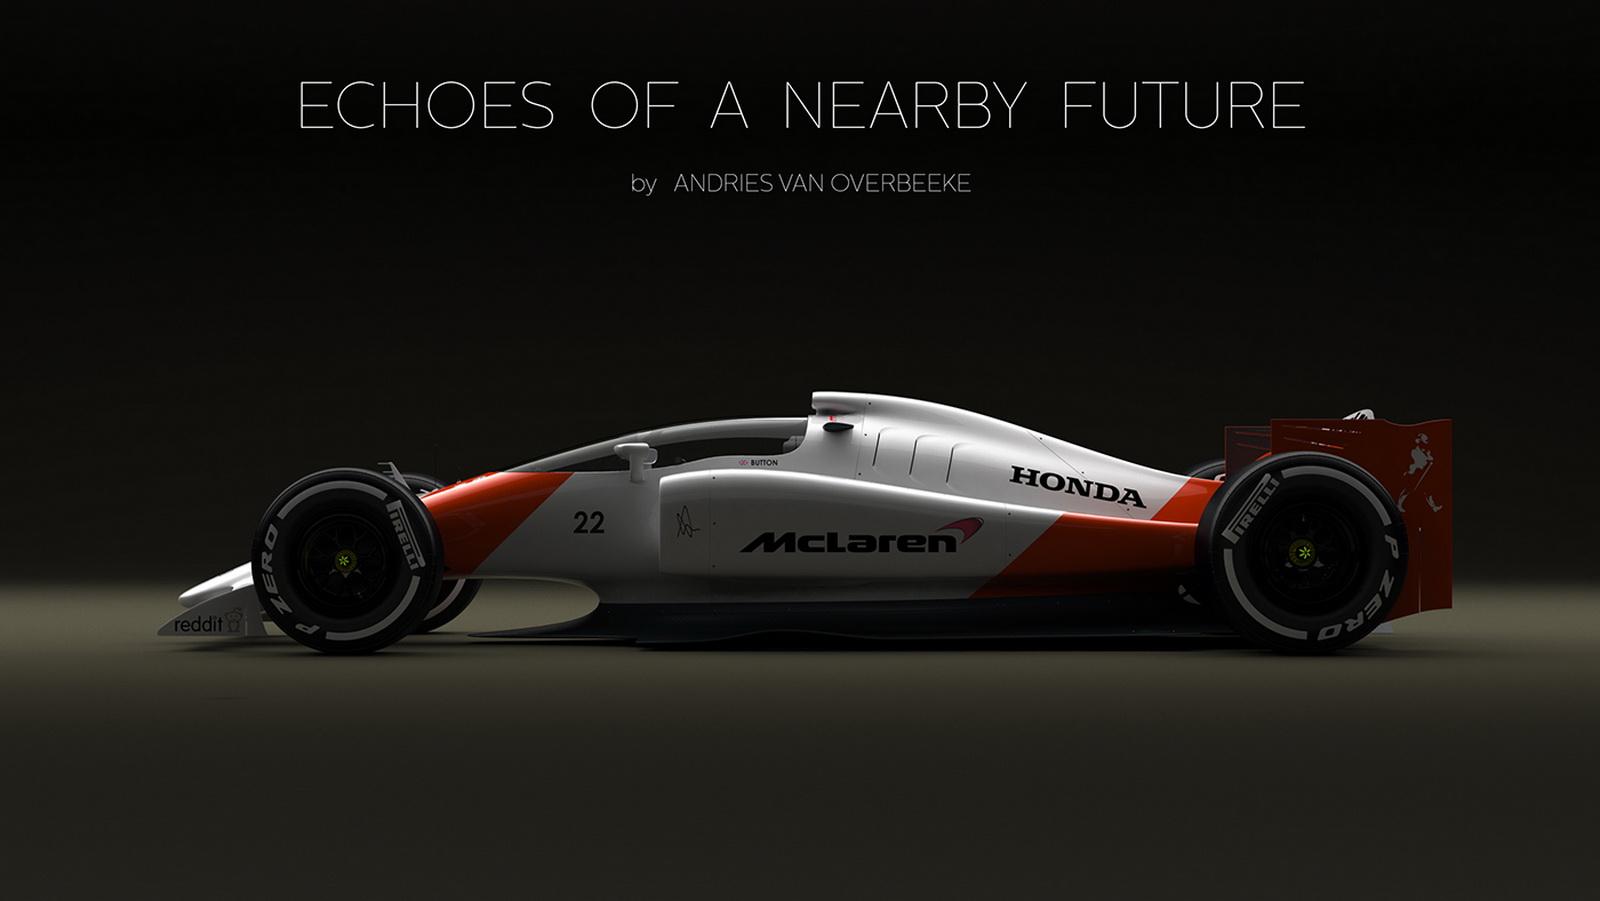 ... Concept Earns Closed Cockpit, Honda-McLaren Livery - autoevolution